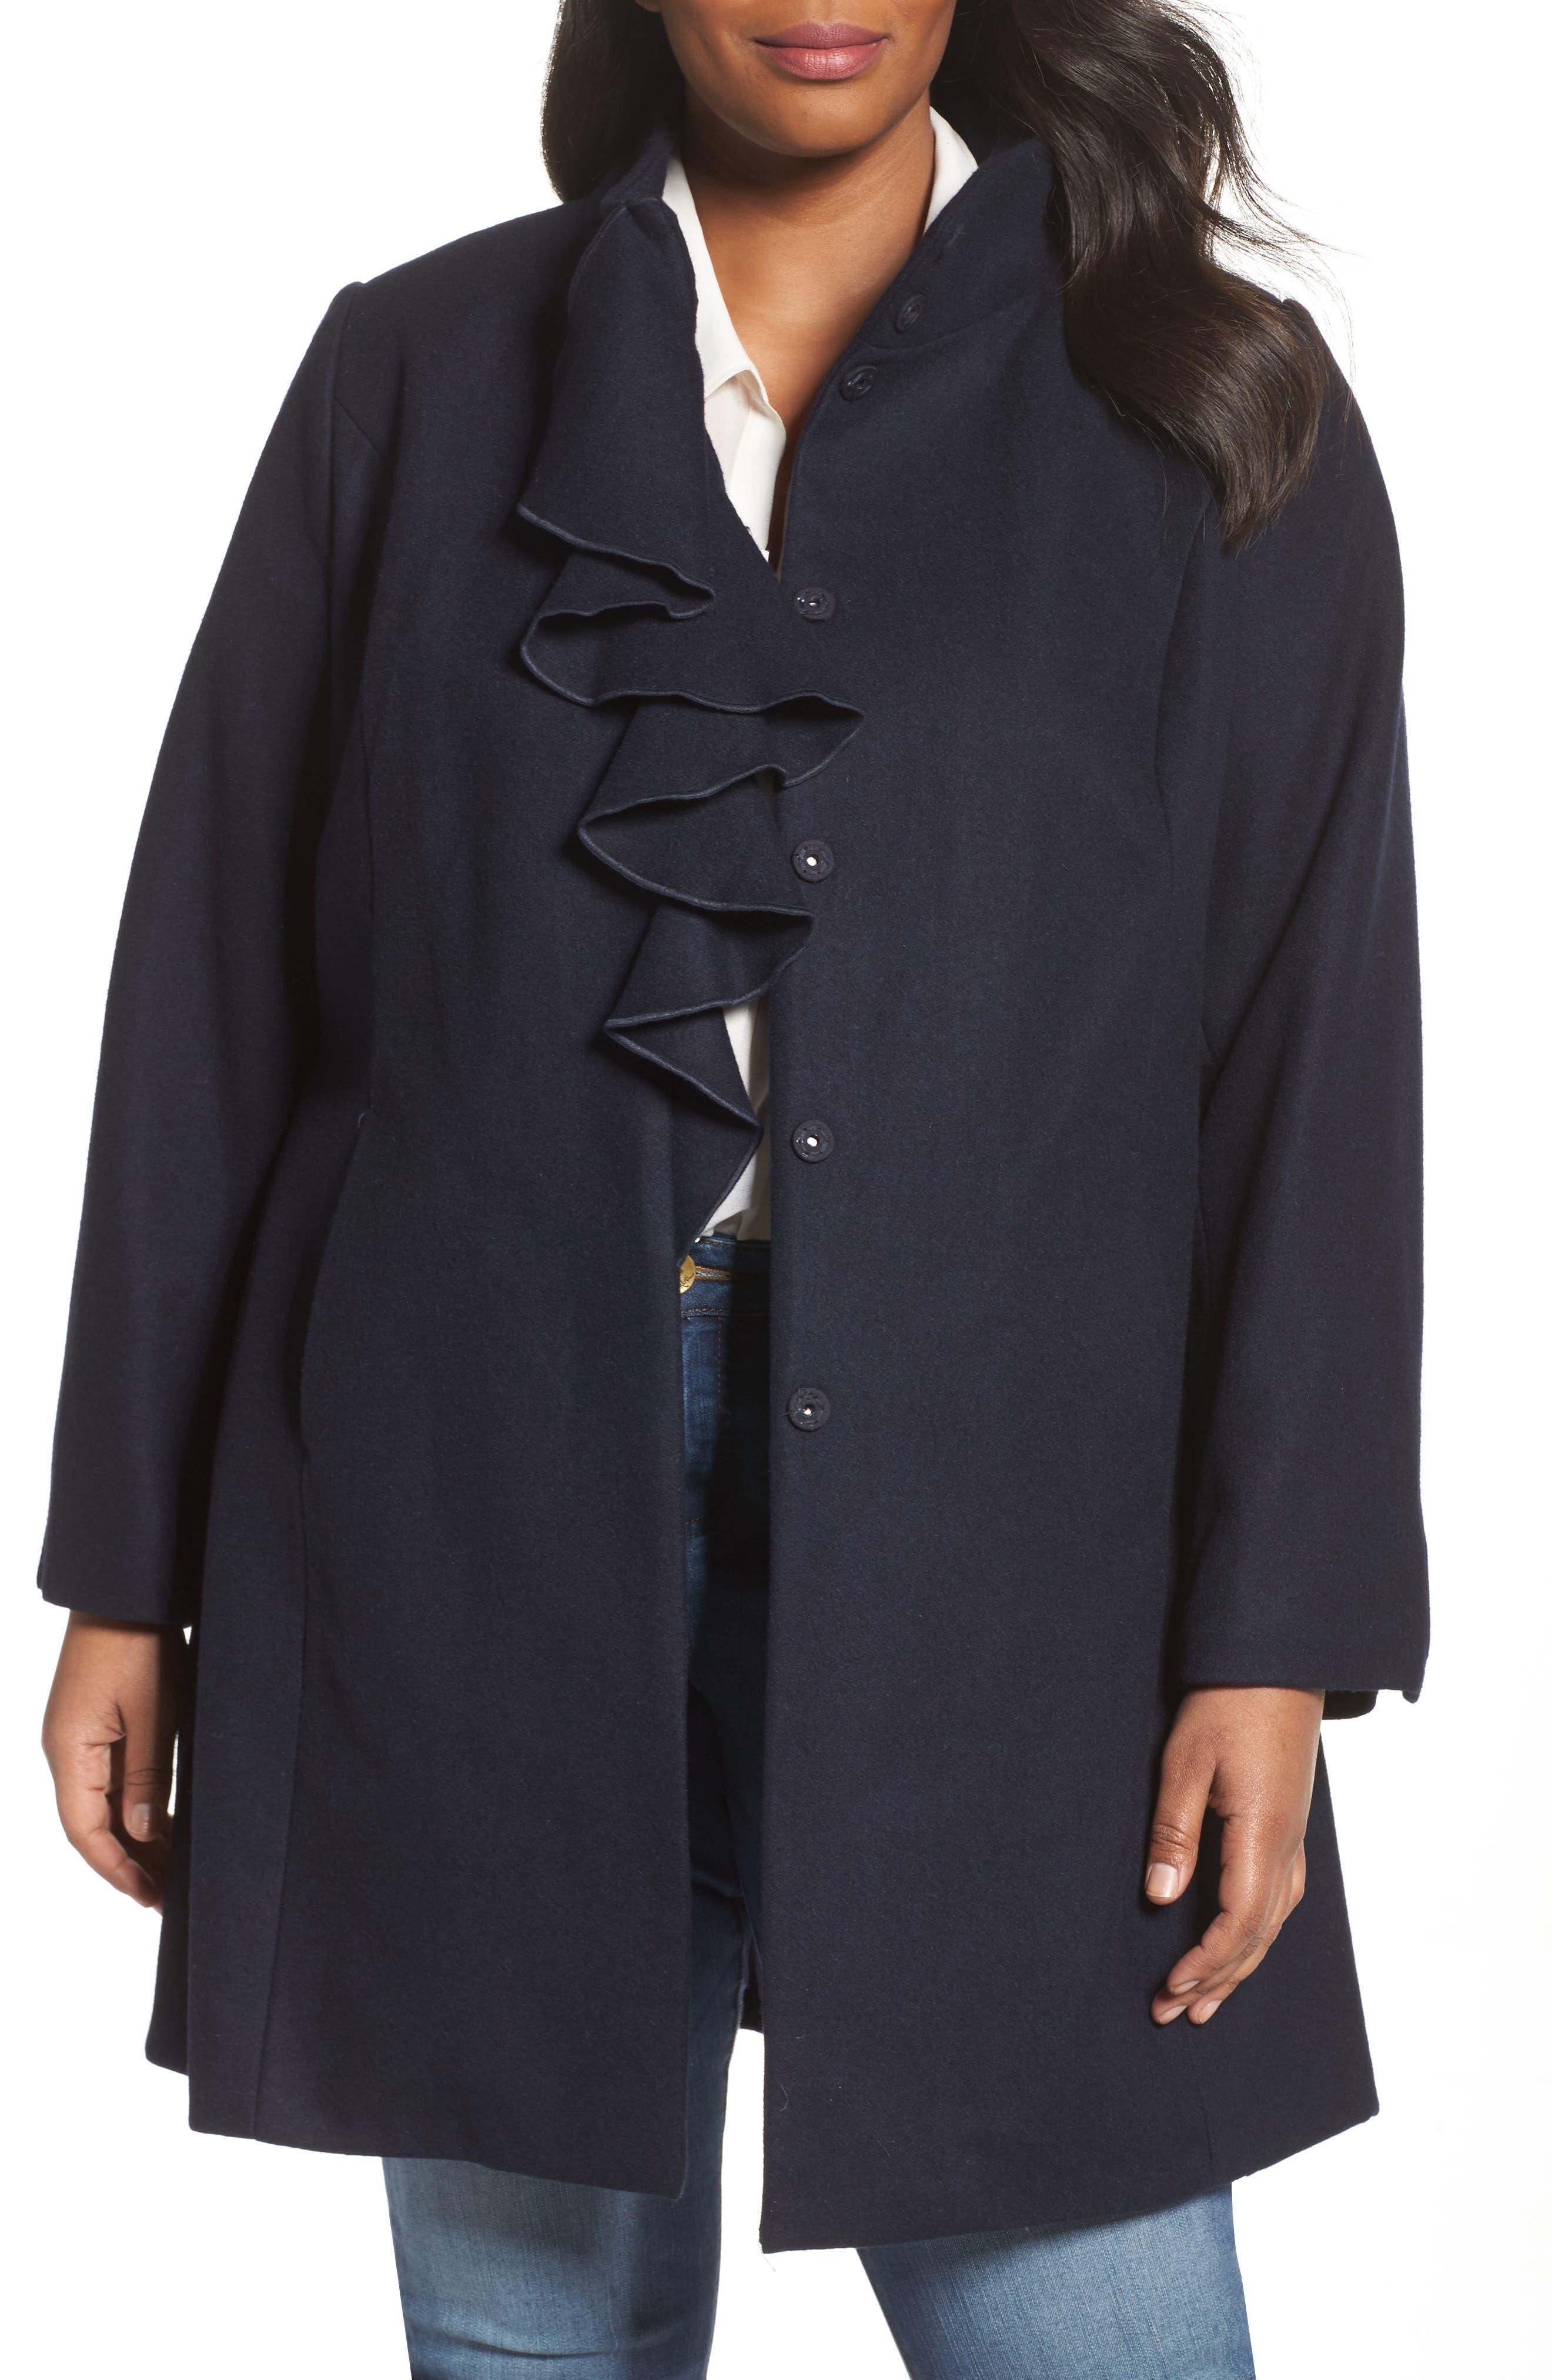 Tahari Kate Ruffle Wool Blend Coat (Plus Size)